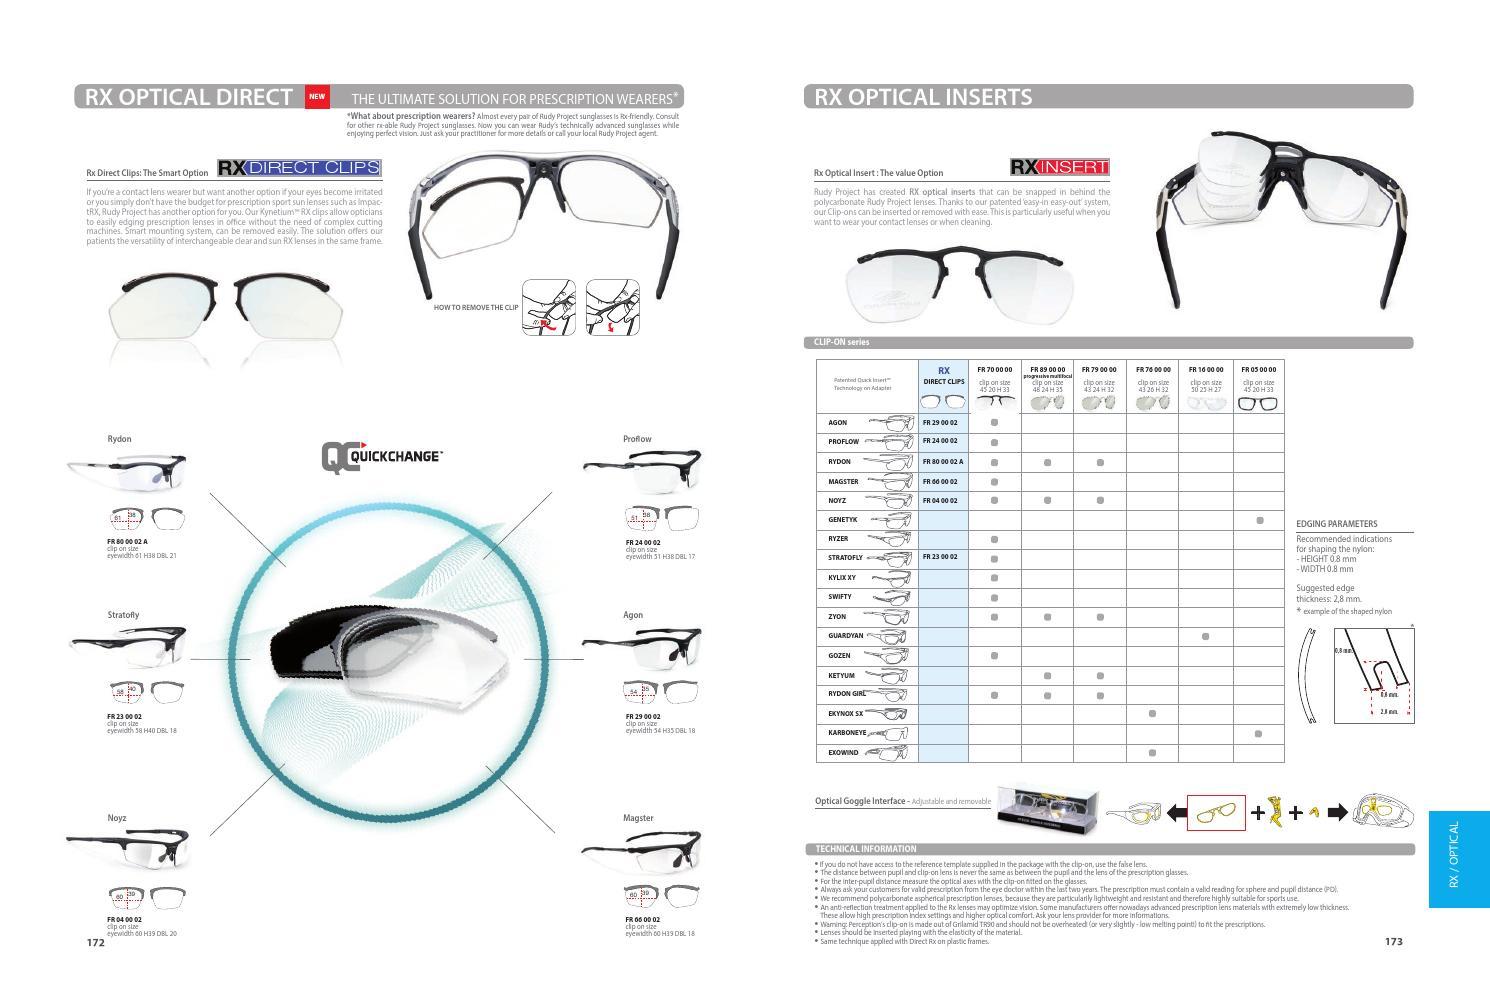 d6bfe28411 Rudy Project 2014 Eyewear